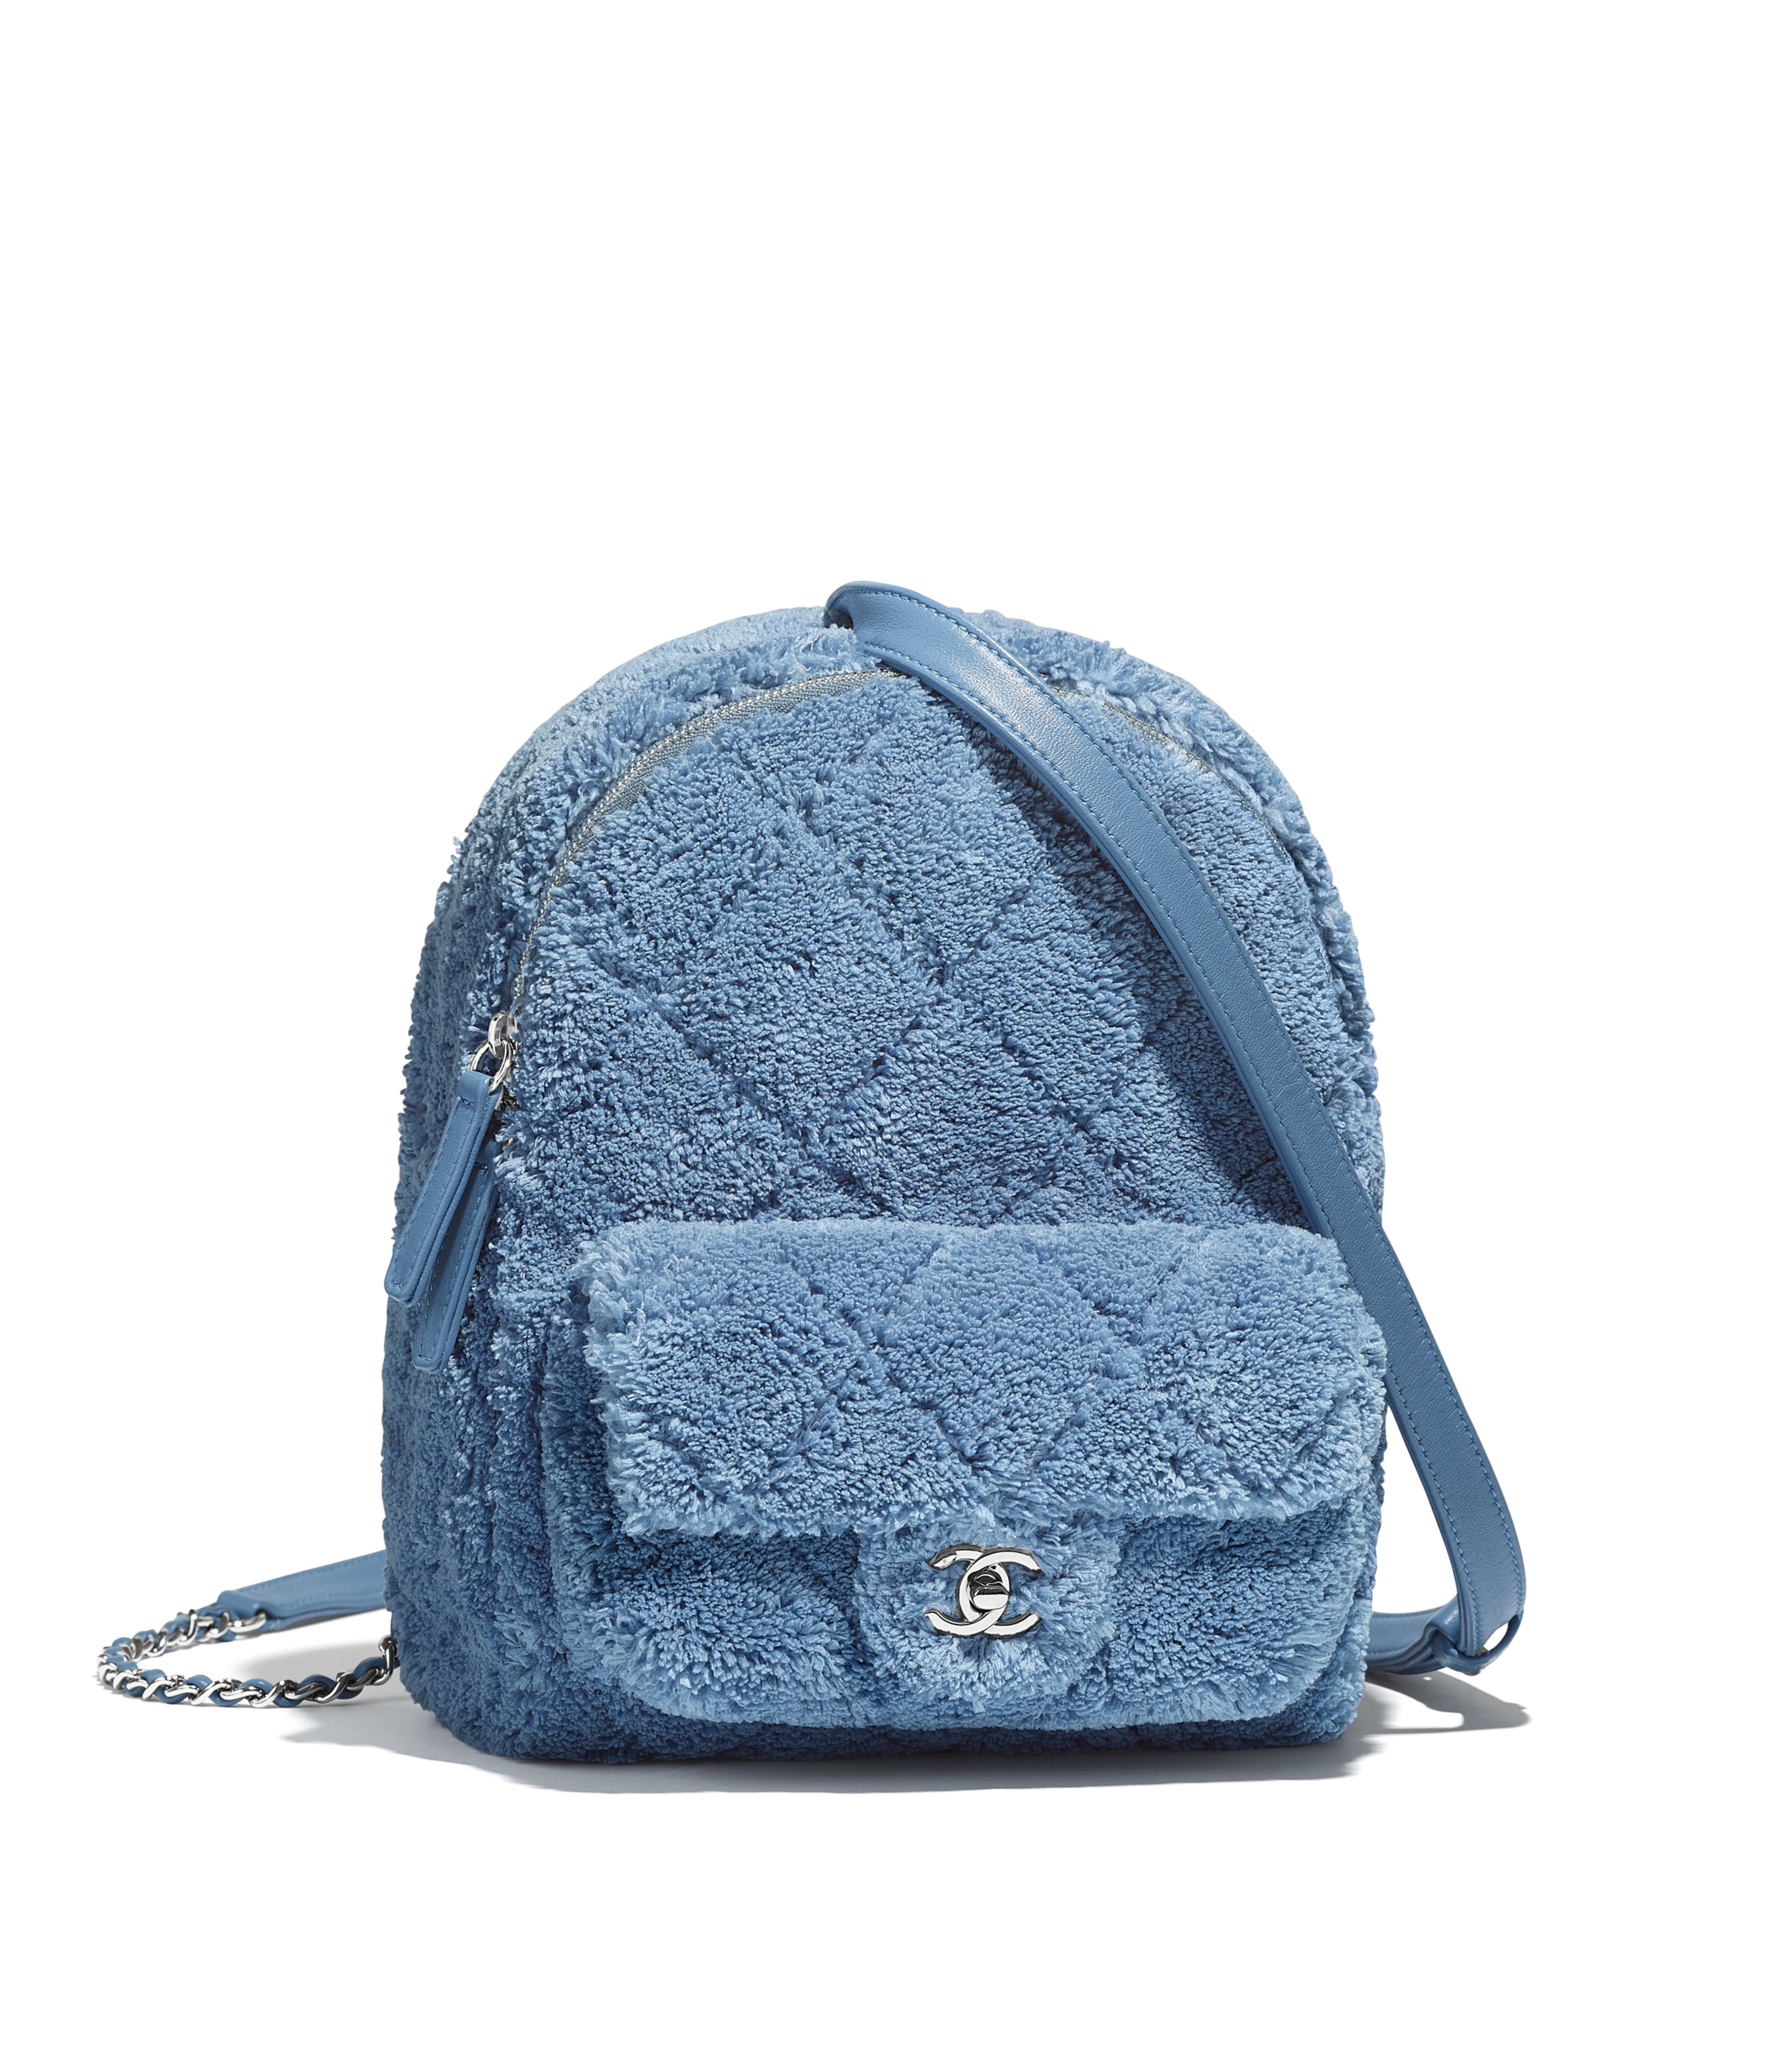 94c8ed22c217 Backpack Mixed Fibers, Lambskin, Calfskin & Silver-Tone Metal, Blue Ref.  AS0604B00385N0902